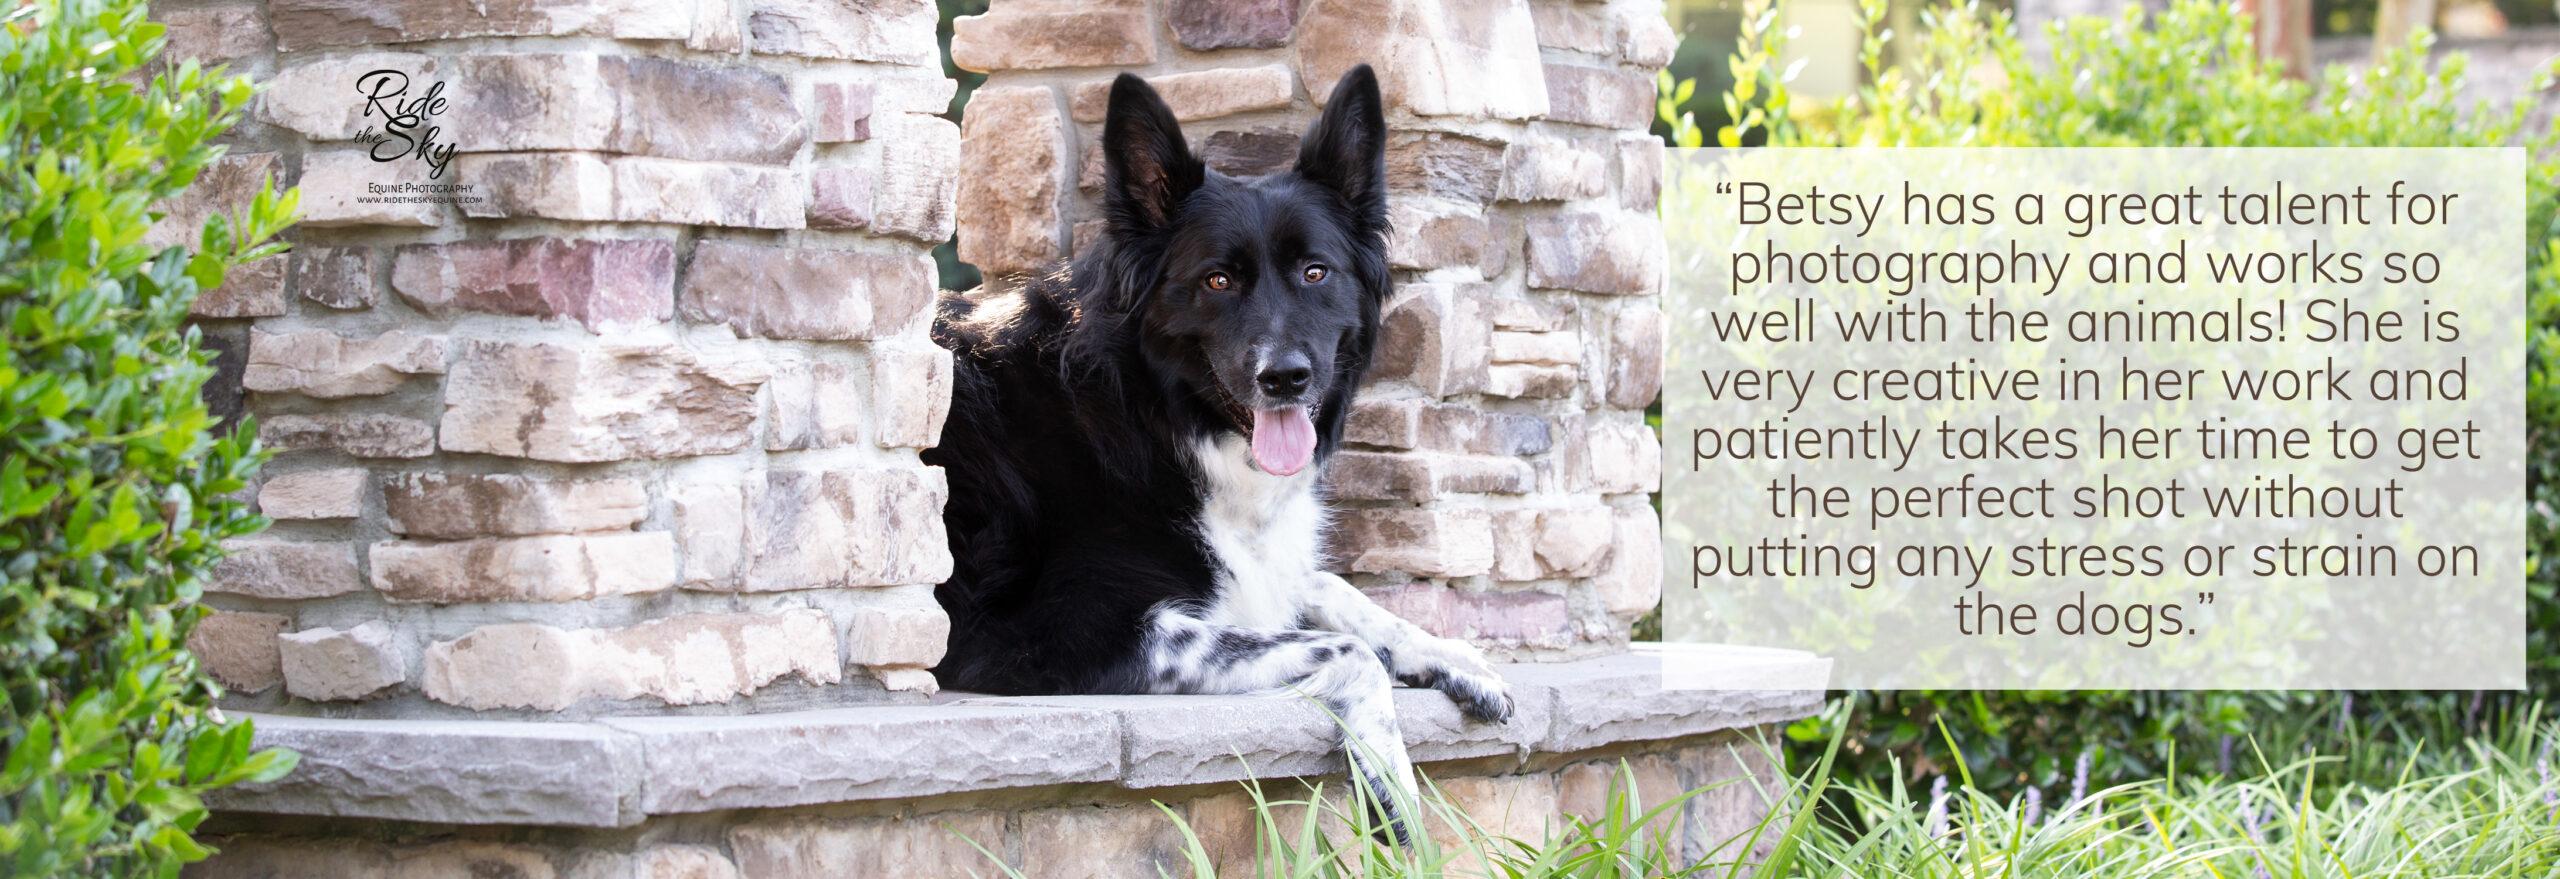 Dog on Stone platform Portrait